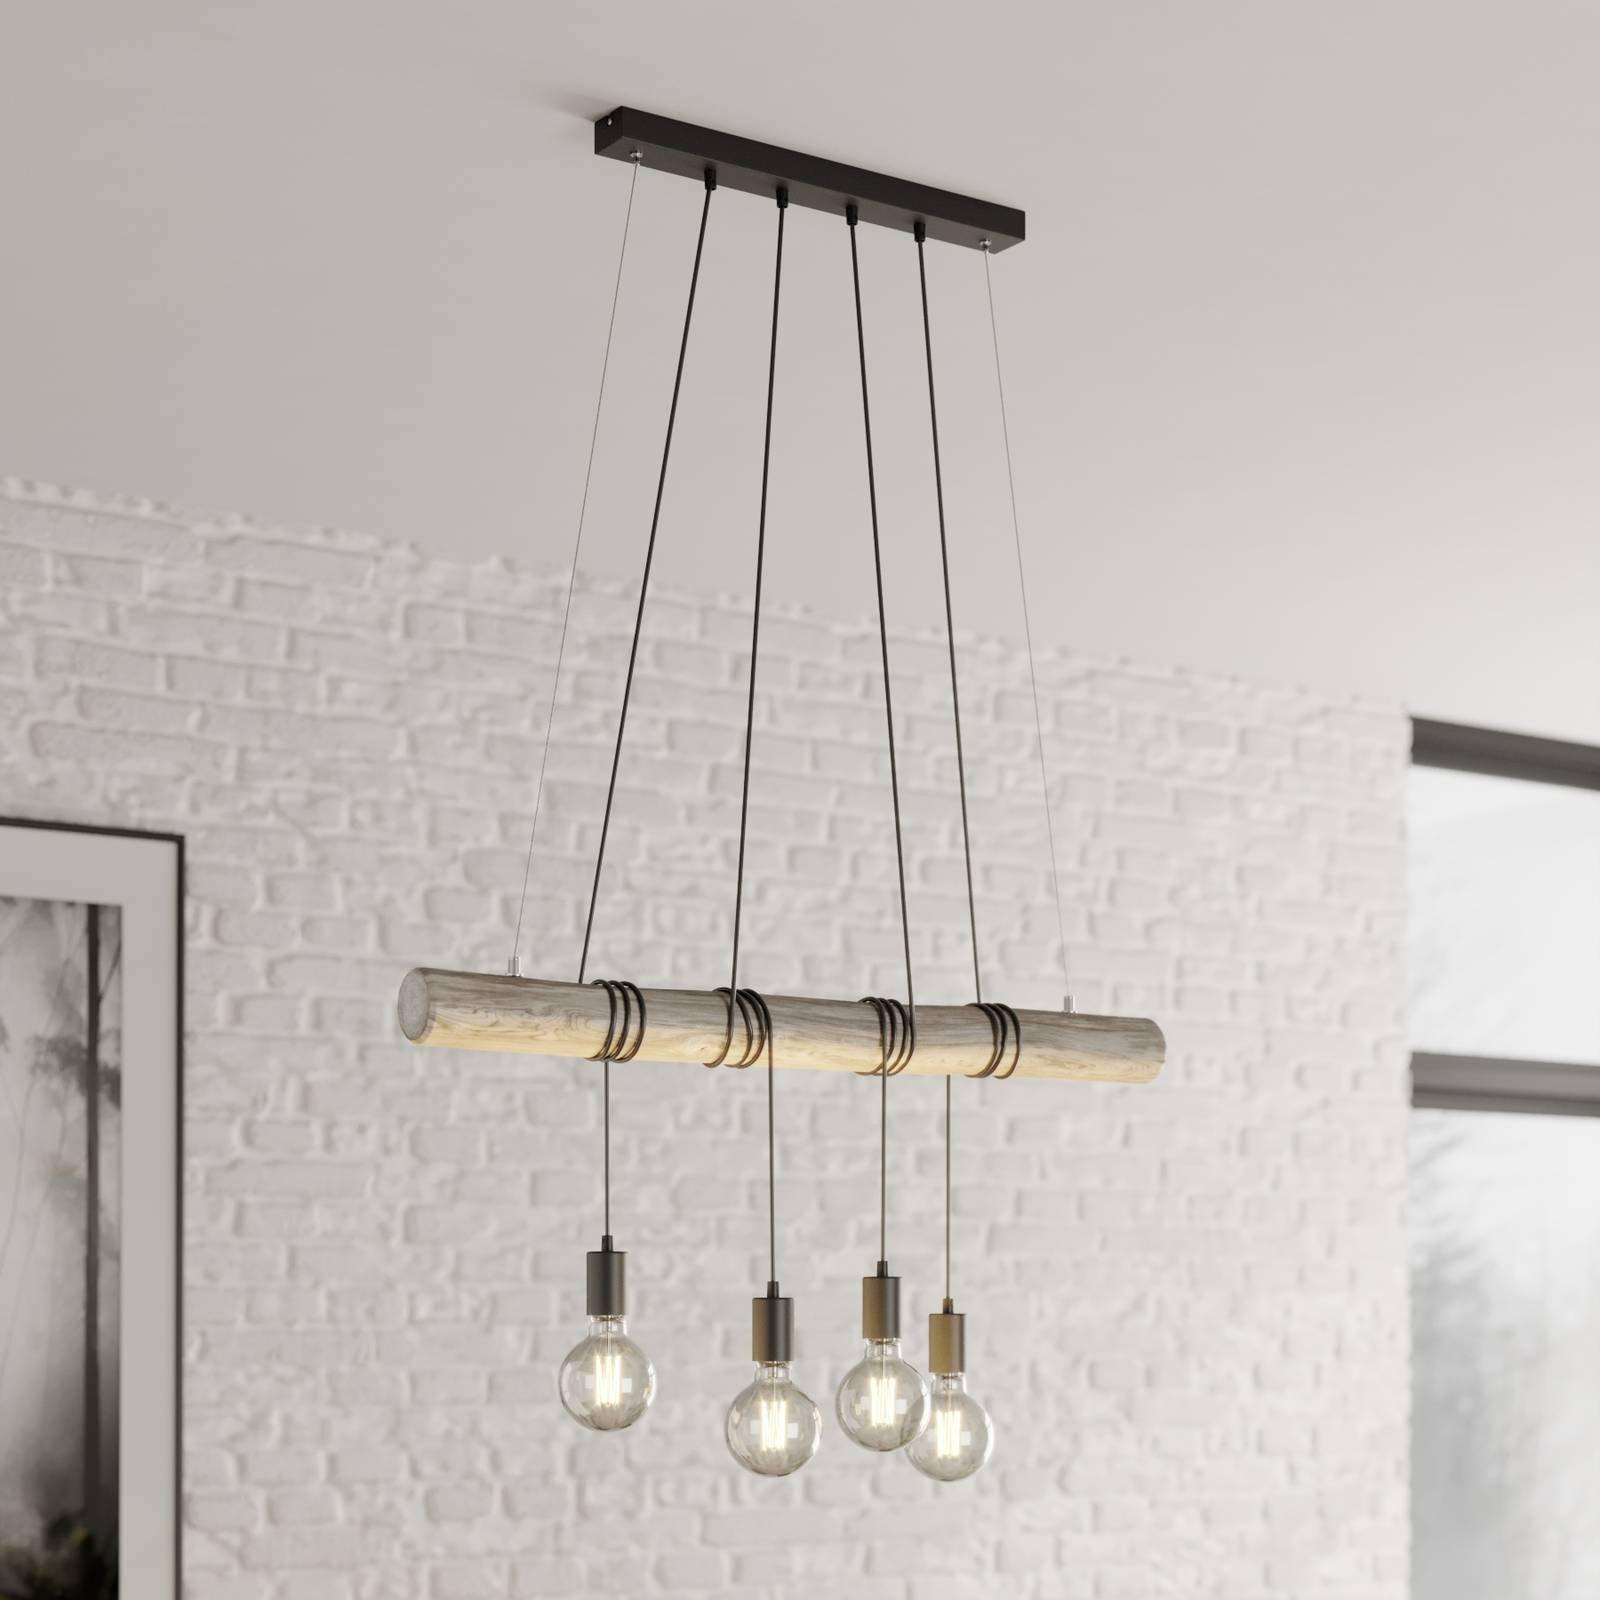 Rohana hanging light  4 black sockets